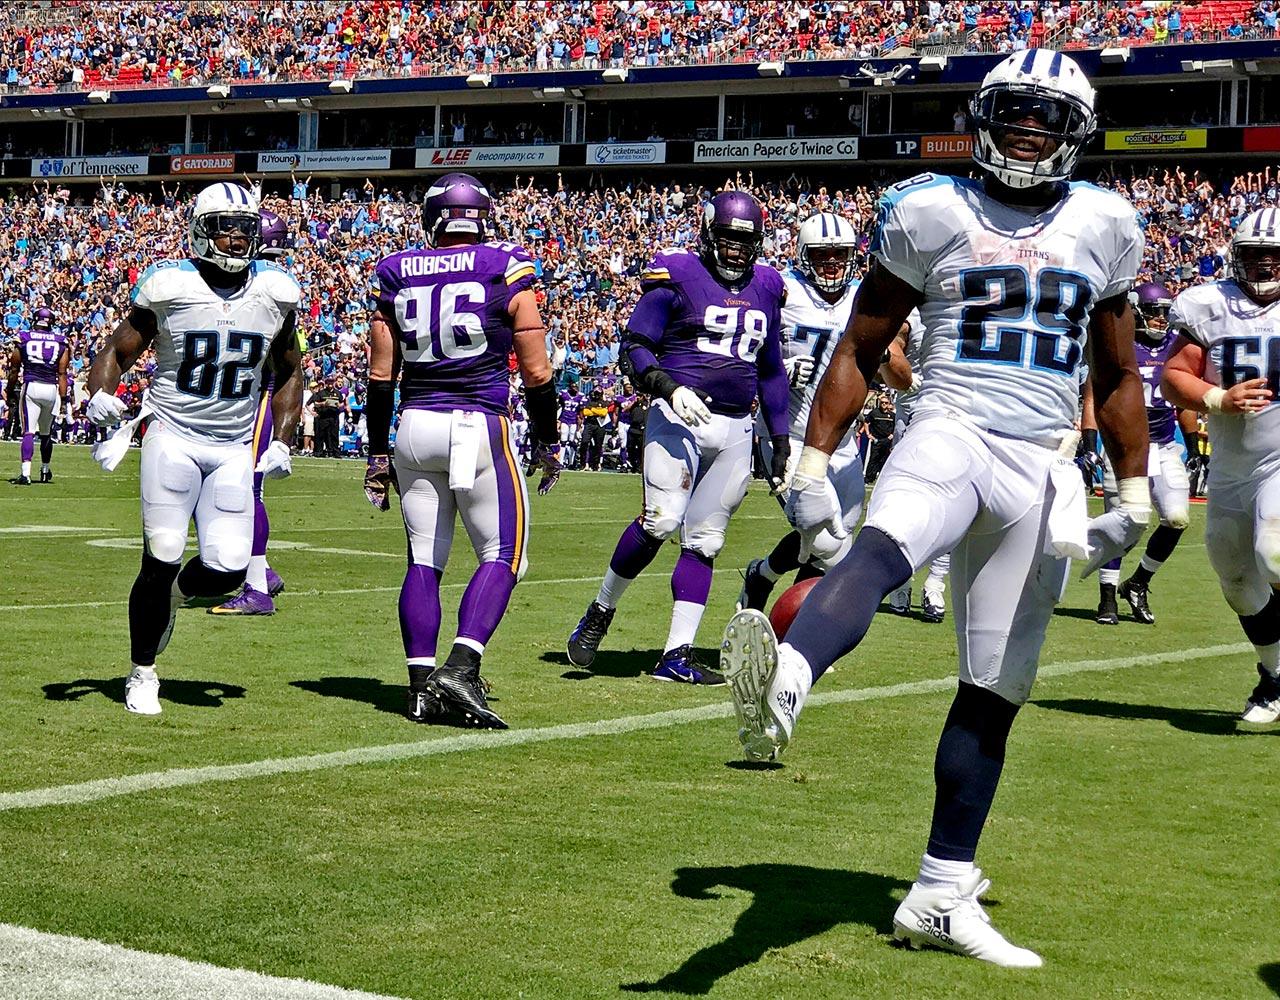 NFL: Minnesota Vikings vs Tennessee Titans NFL: Minnesota Vikings vs Tennessee Titans Nissan Stadium/Nashville, TN 09/11/2016 SI-537 TK1 Credit: David Klutho